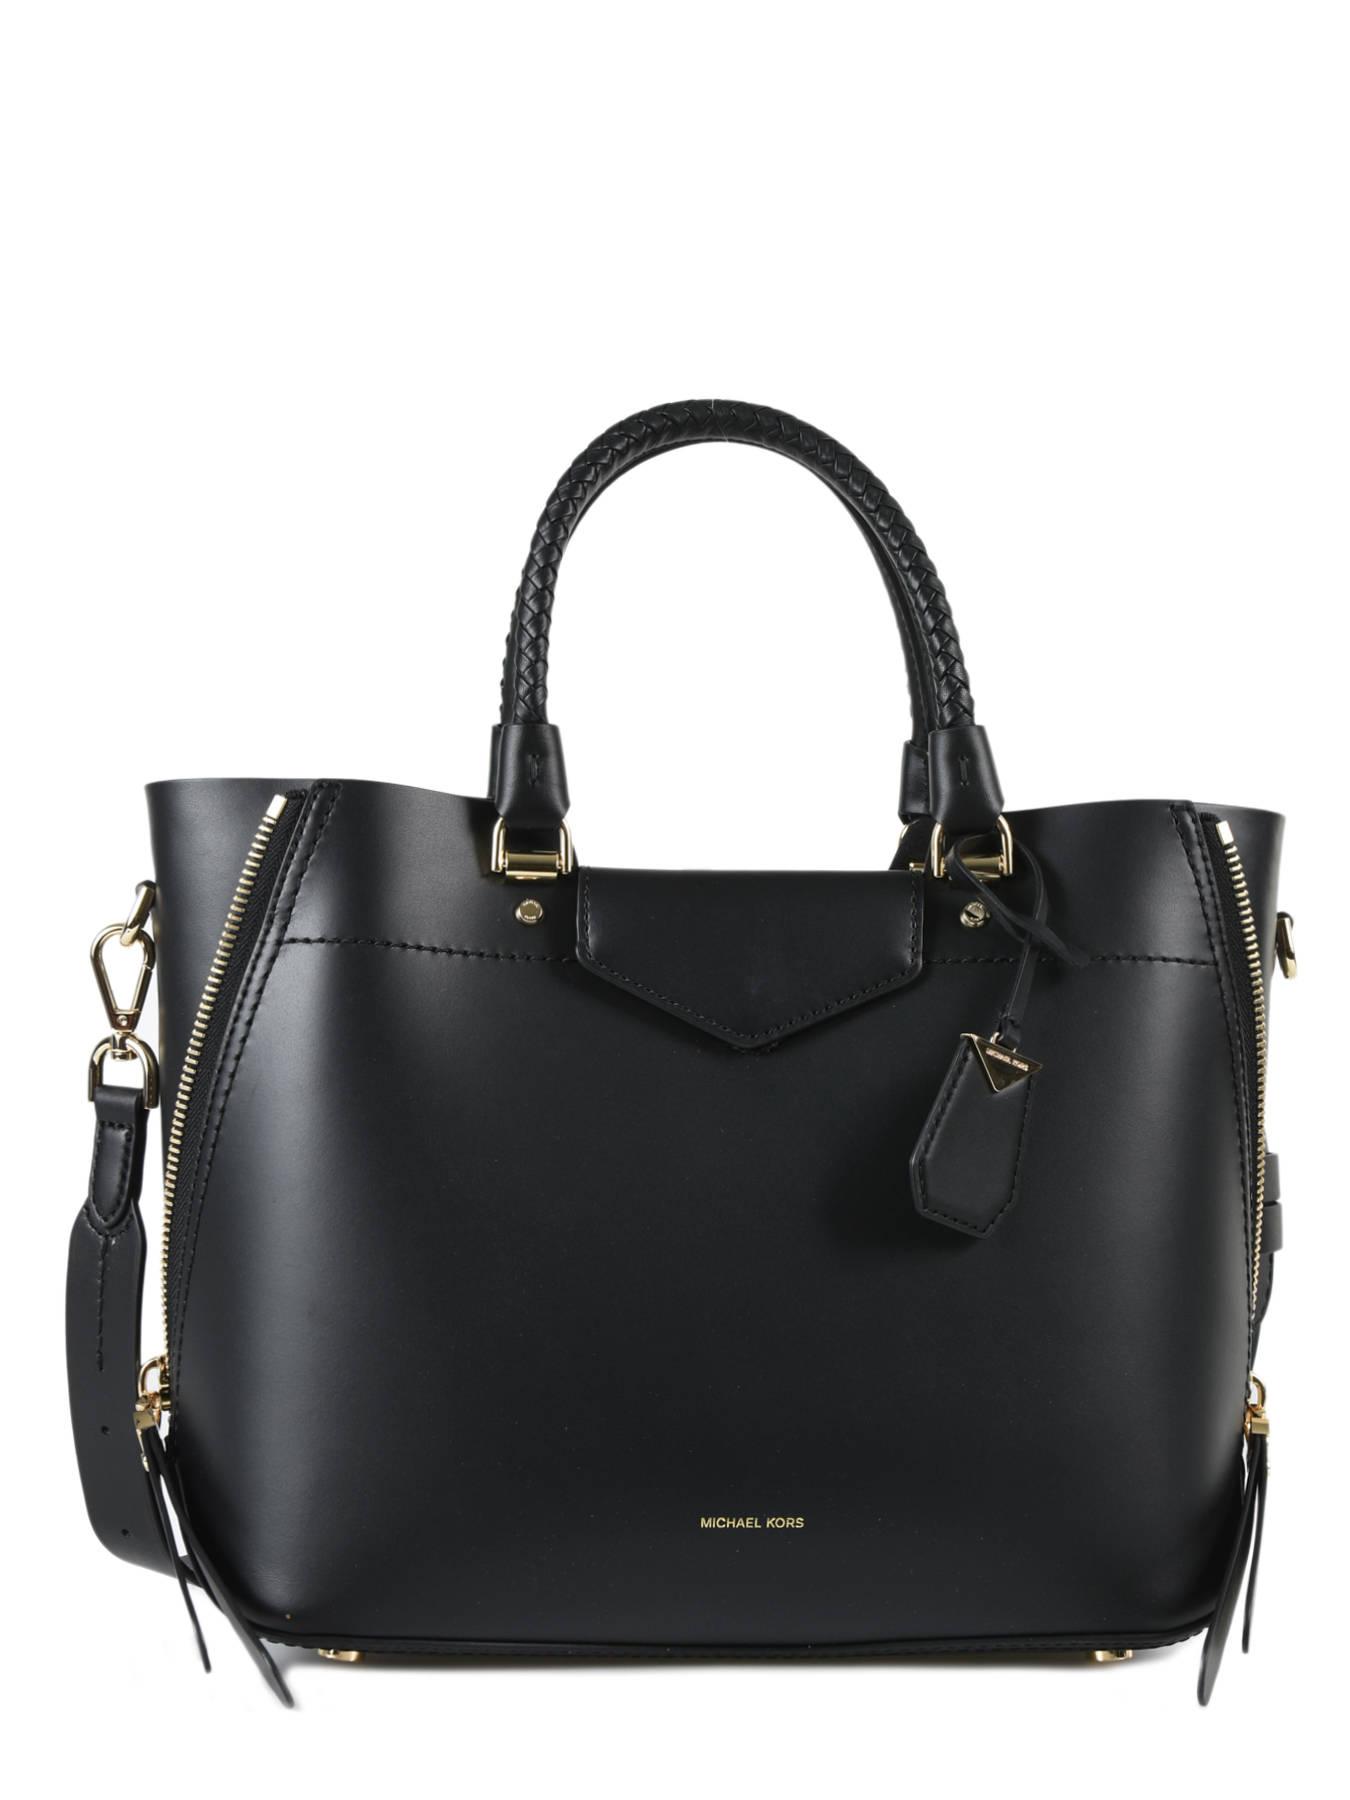 8d2abfdde712a ... Shopping Bag Blakely Leather Michael kors Black blakely S8GZLT2L ...